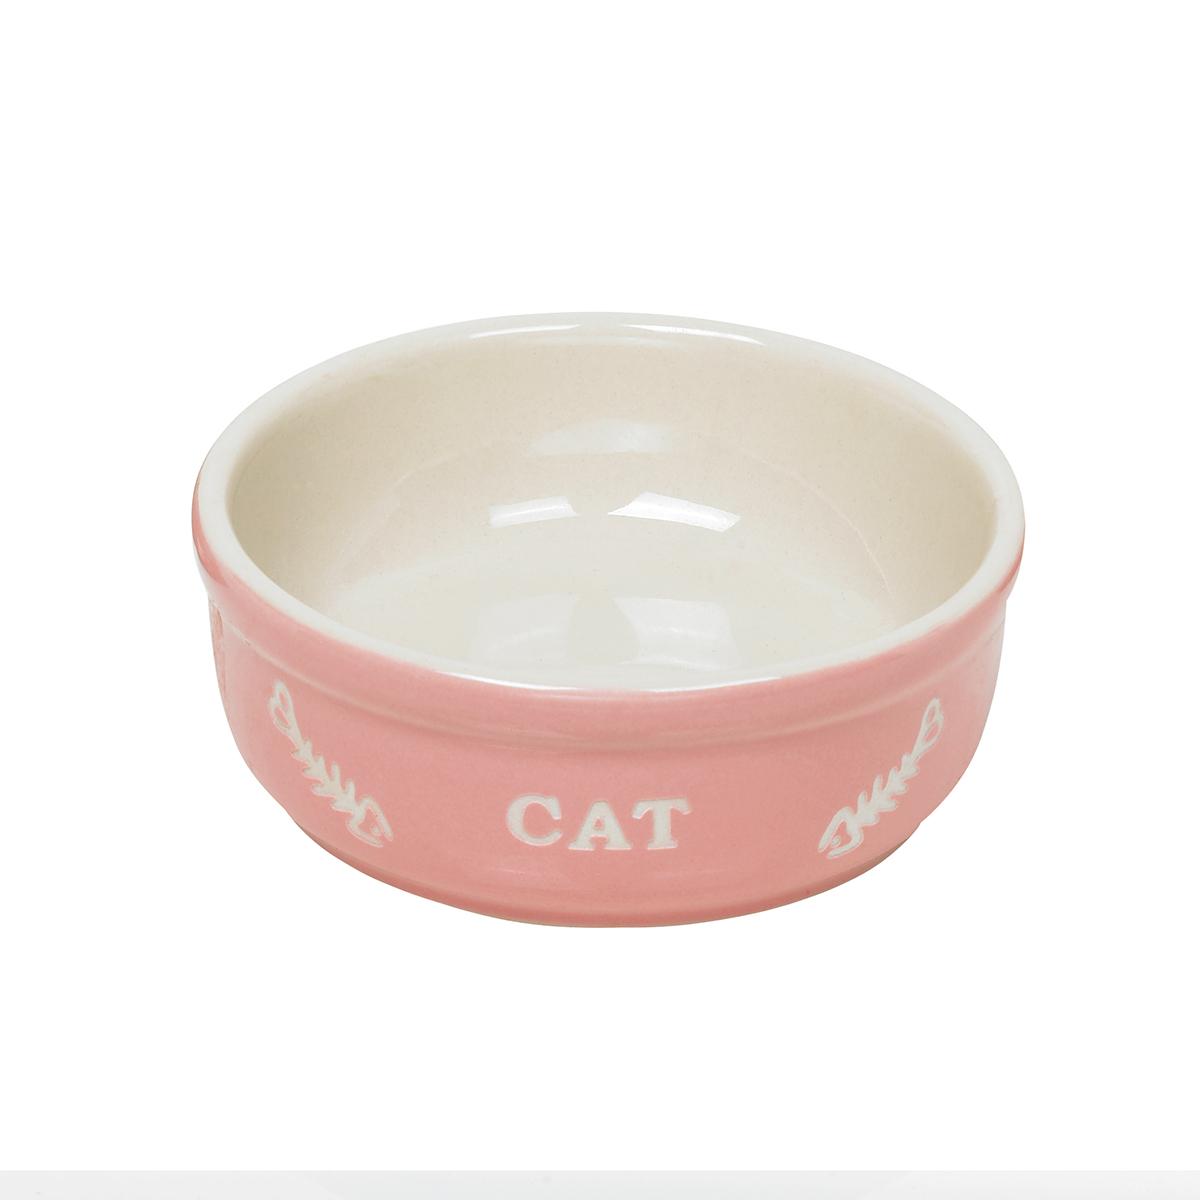 NB CAT EETBAK ROZE/BEIG.13,5CM 00002